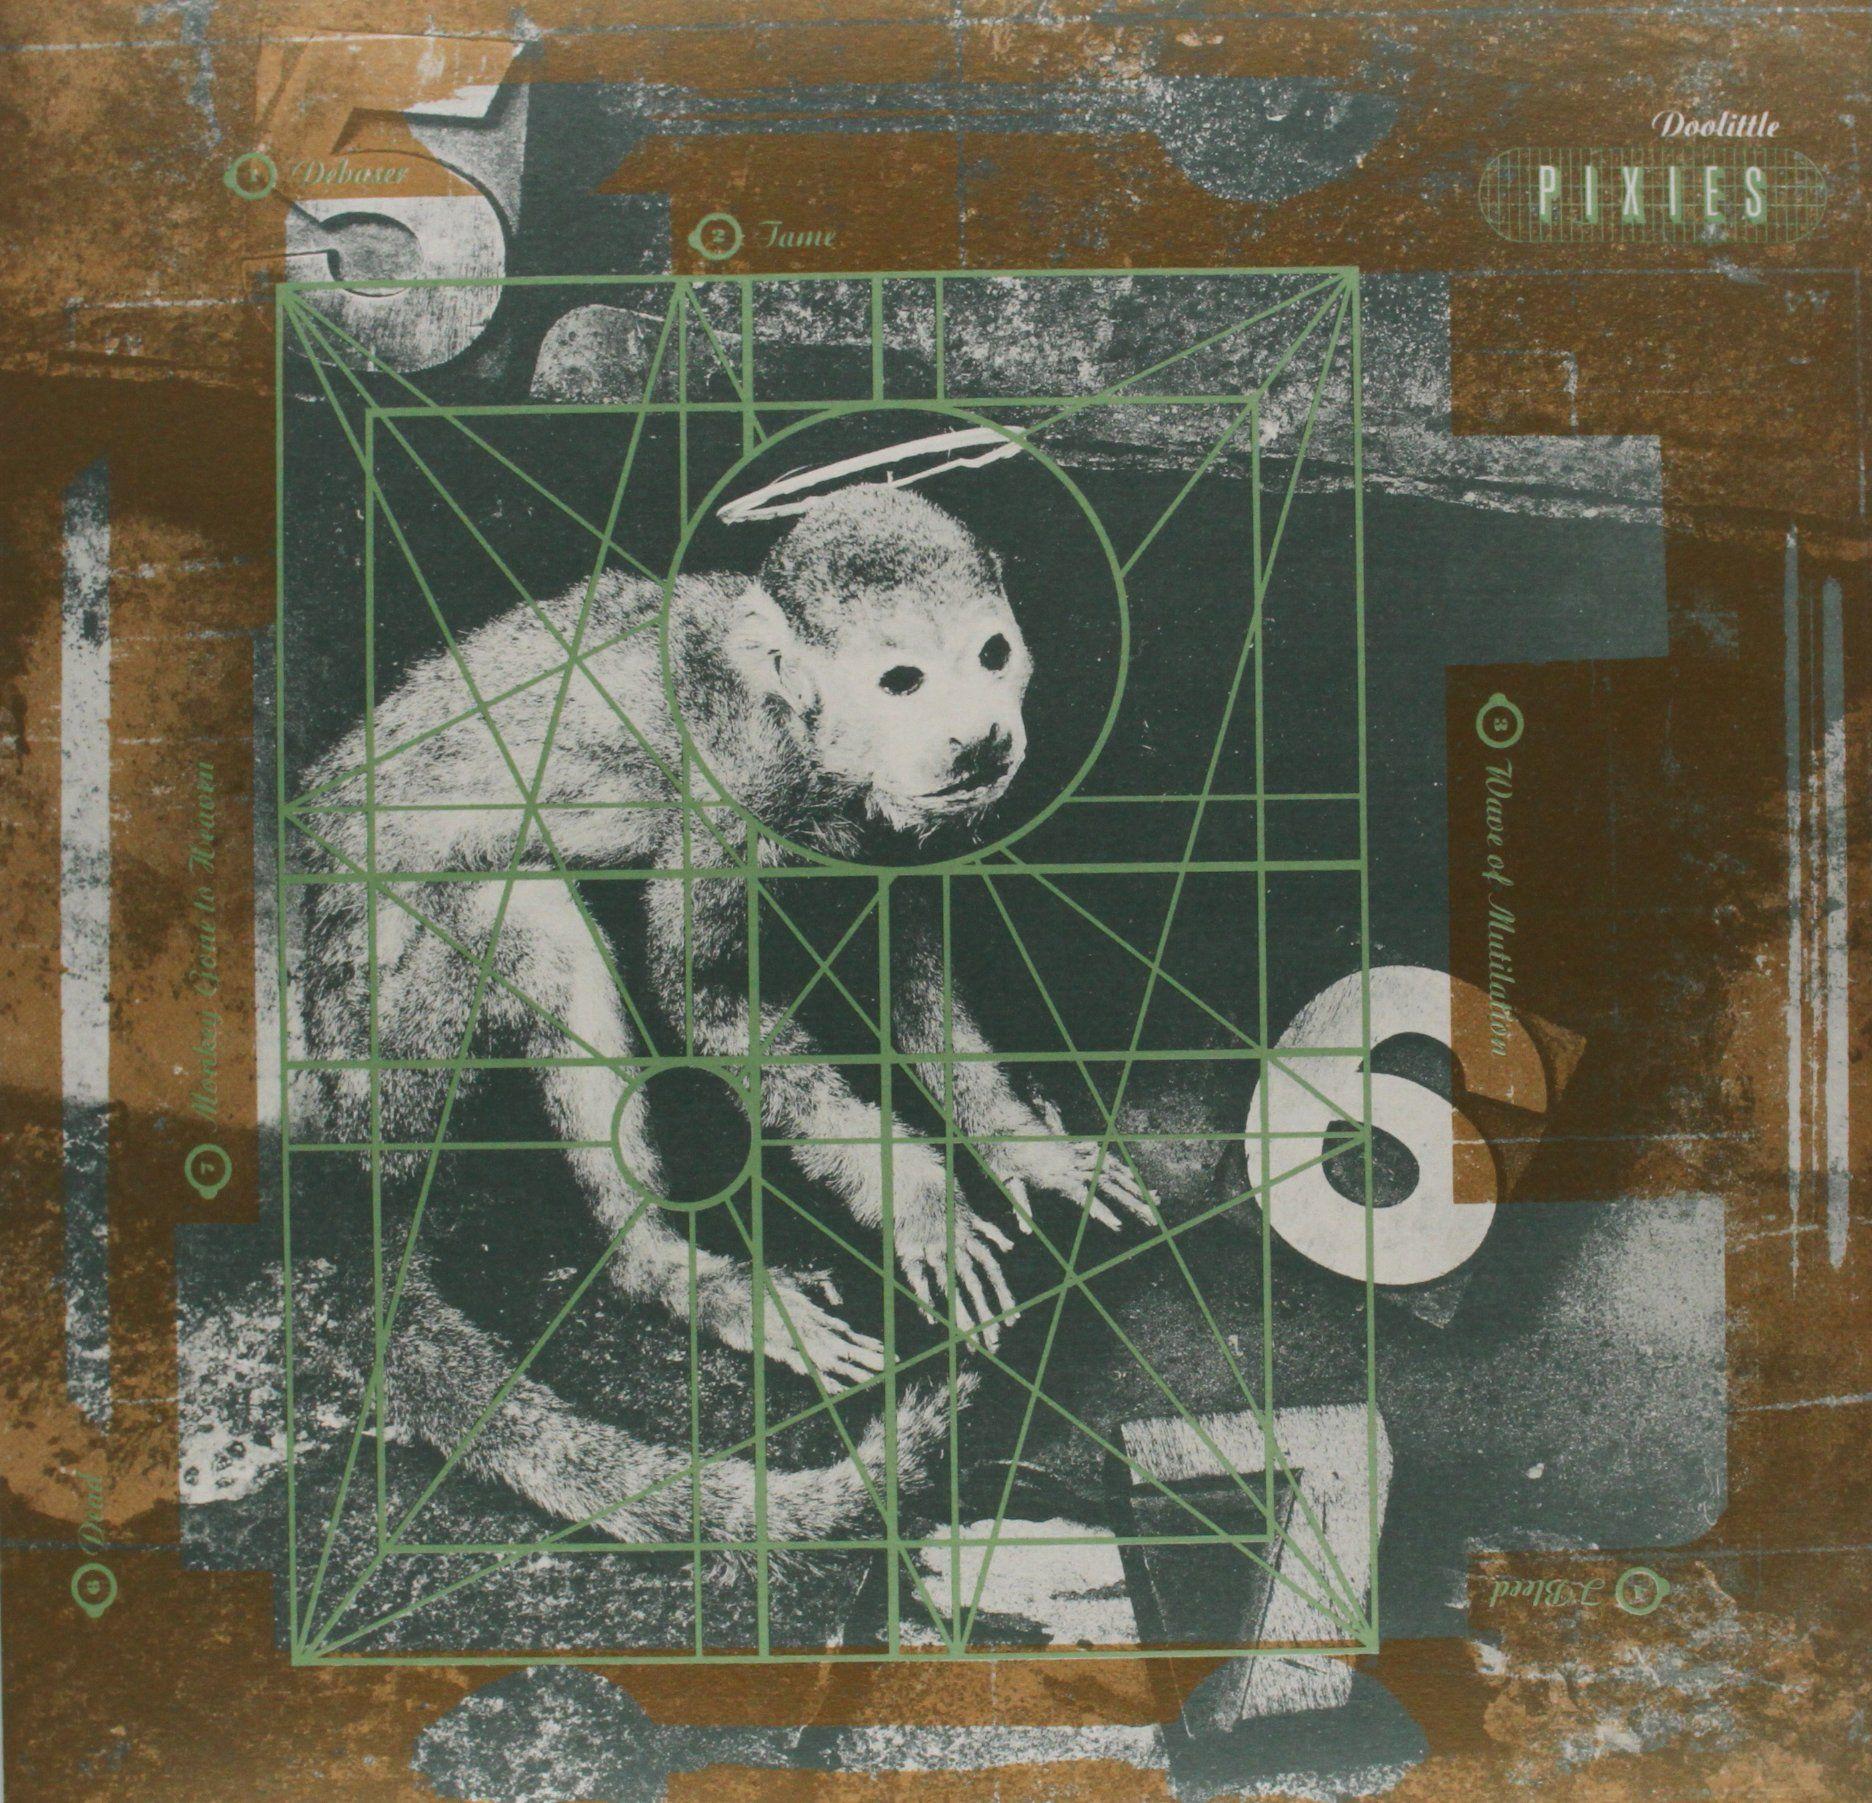 Doolittle Vinyl Vinyl Pinterest Album Covers